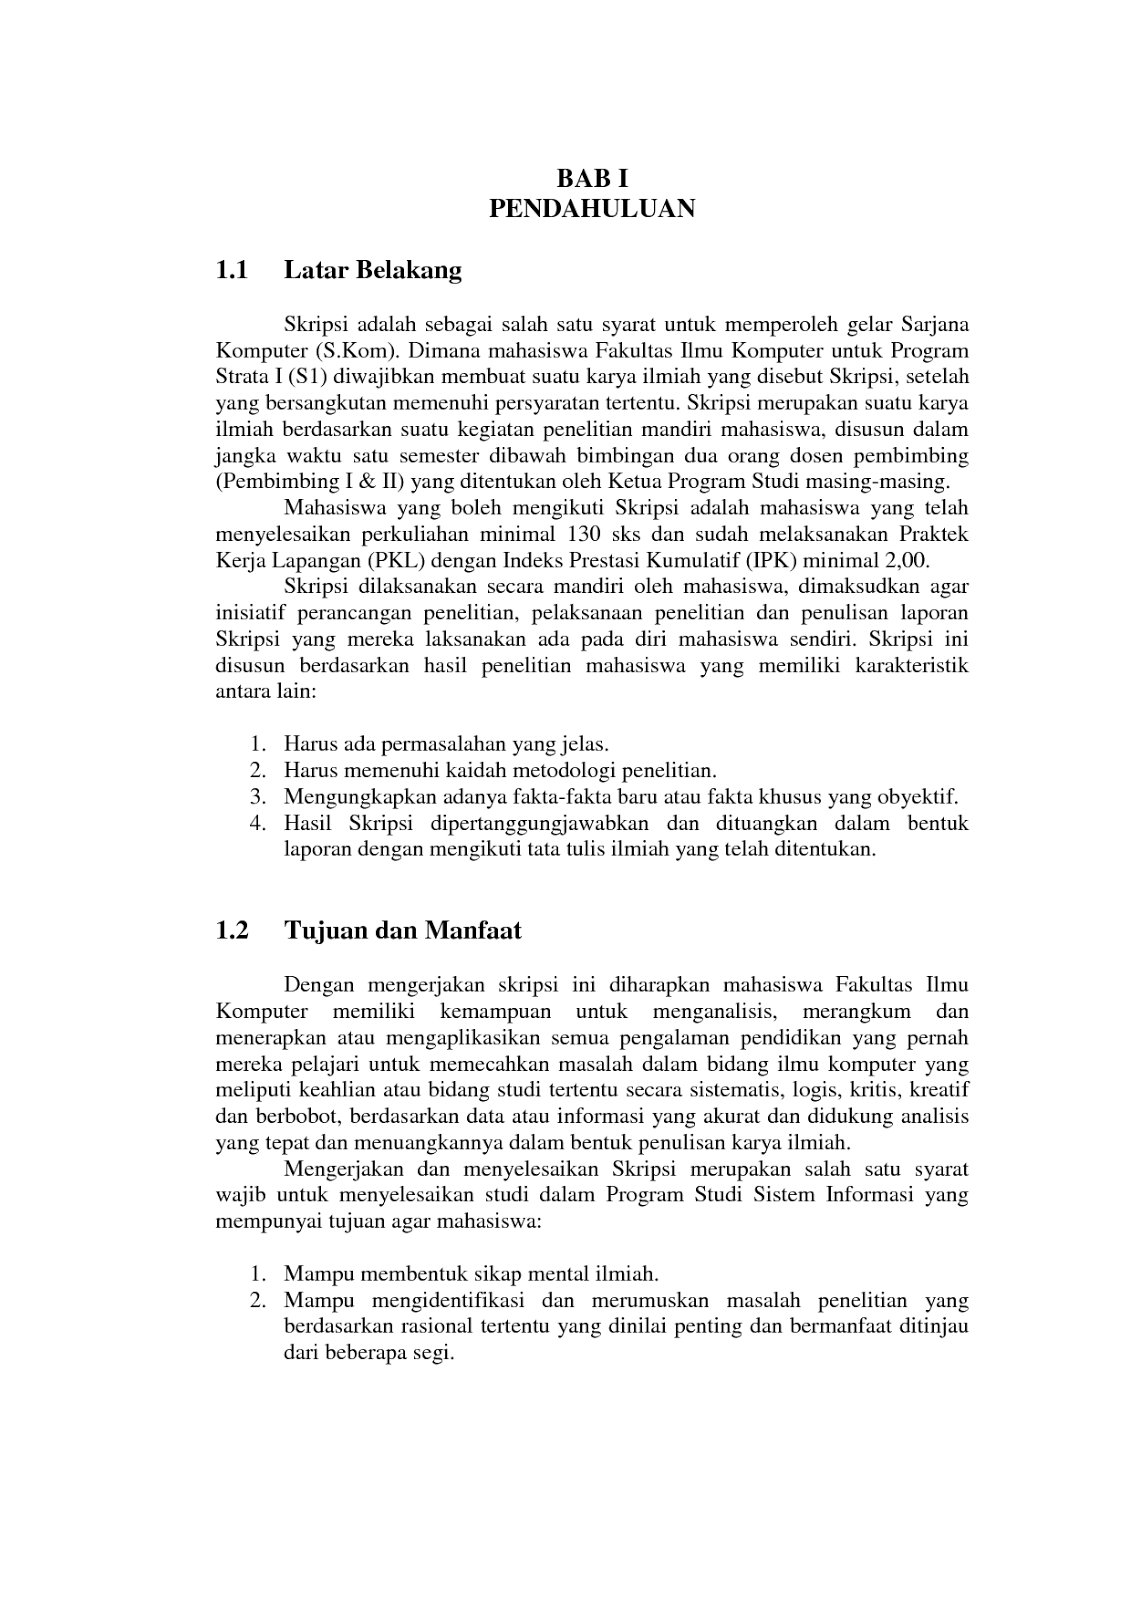 Skripsi Dan Tugas Akhir Informatika Komputer Contoh Proposal Pengajuan Judul Skripsi Dan Tugas Akhir Jurusan Komputer